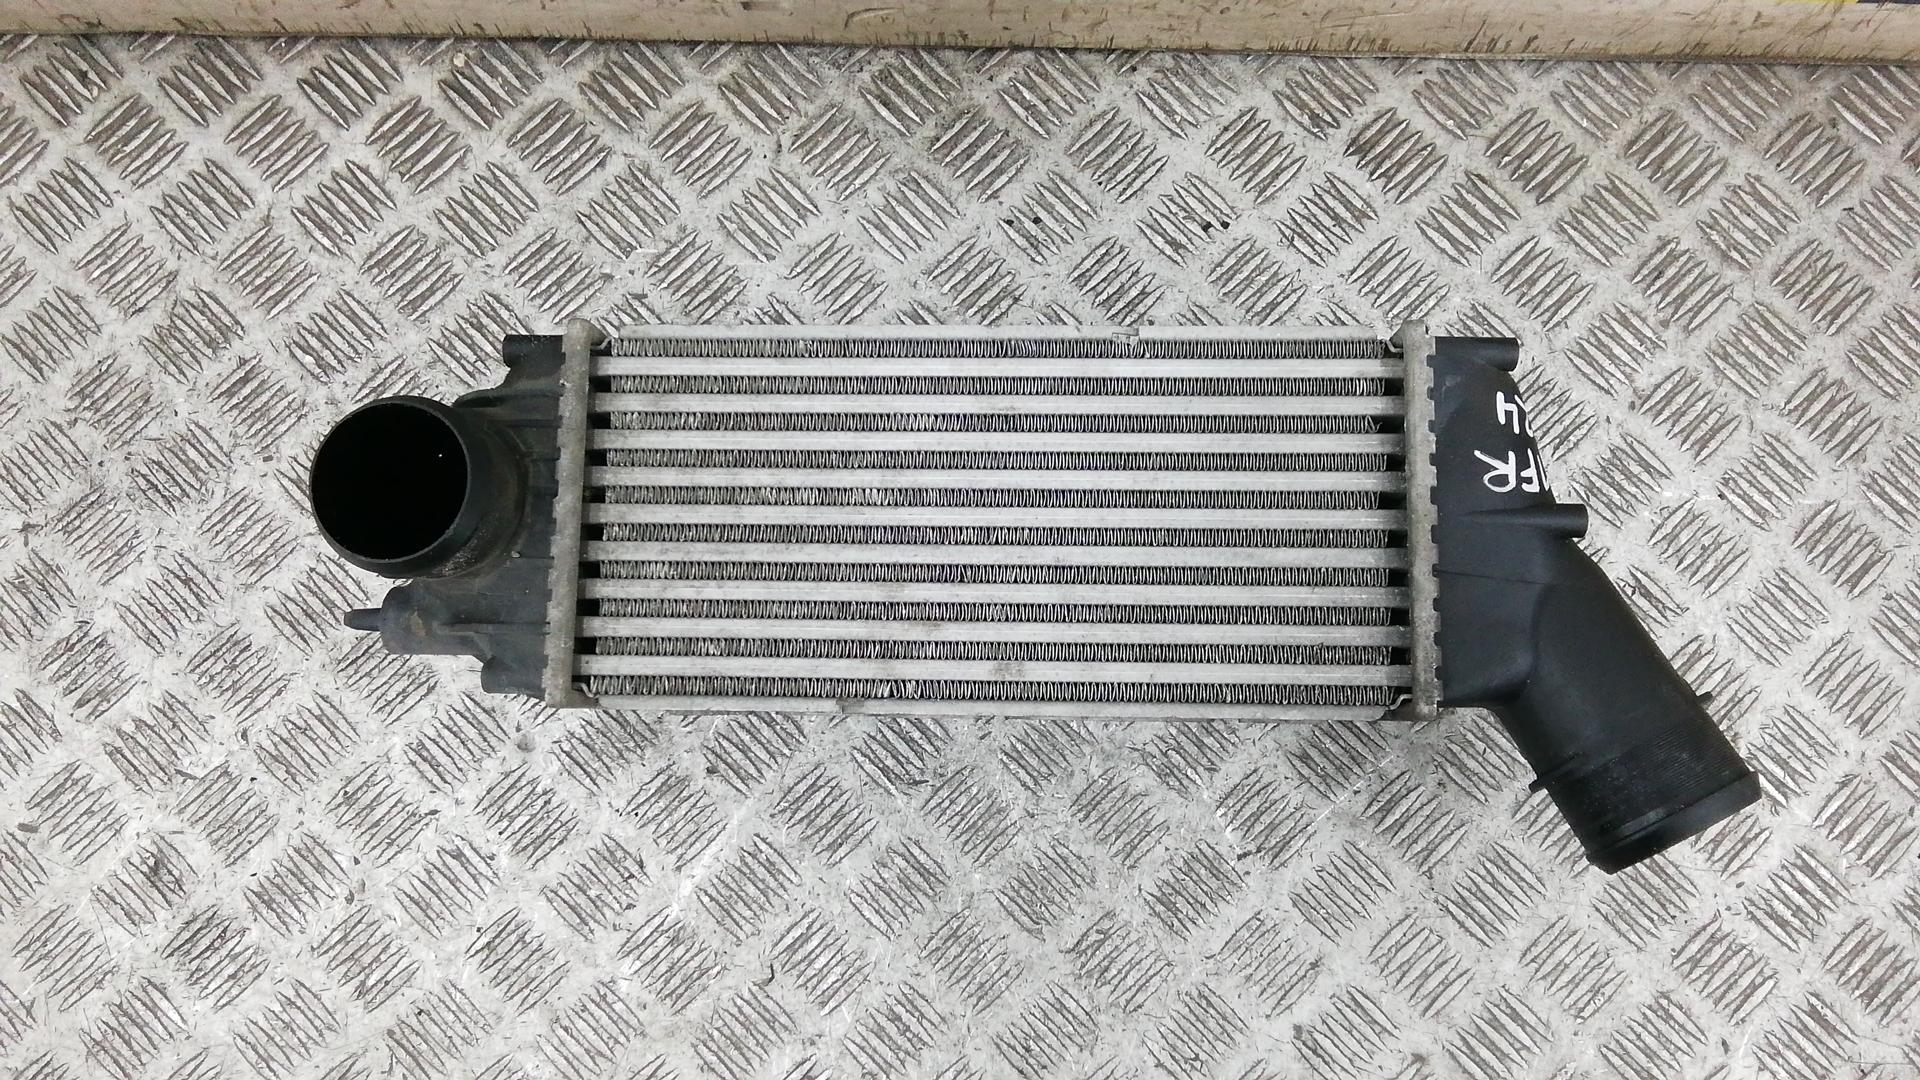 Радиатор интеркуллера, PEUGEOT, 307, 2004